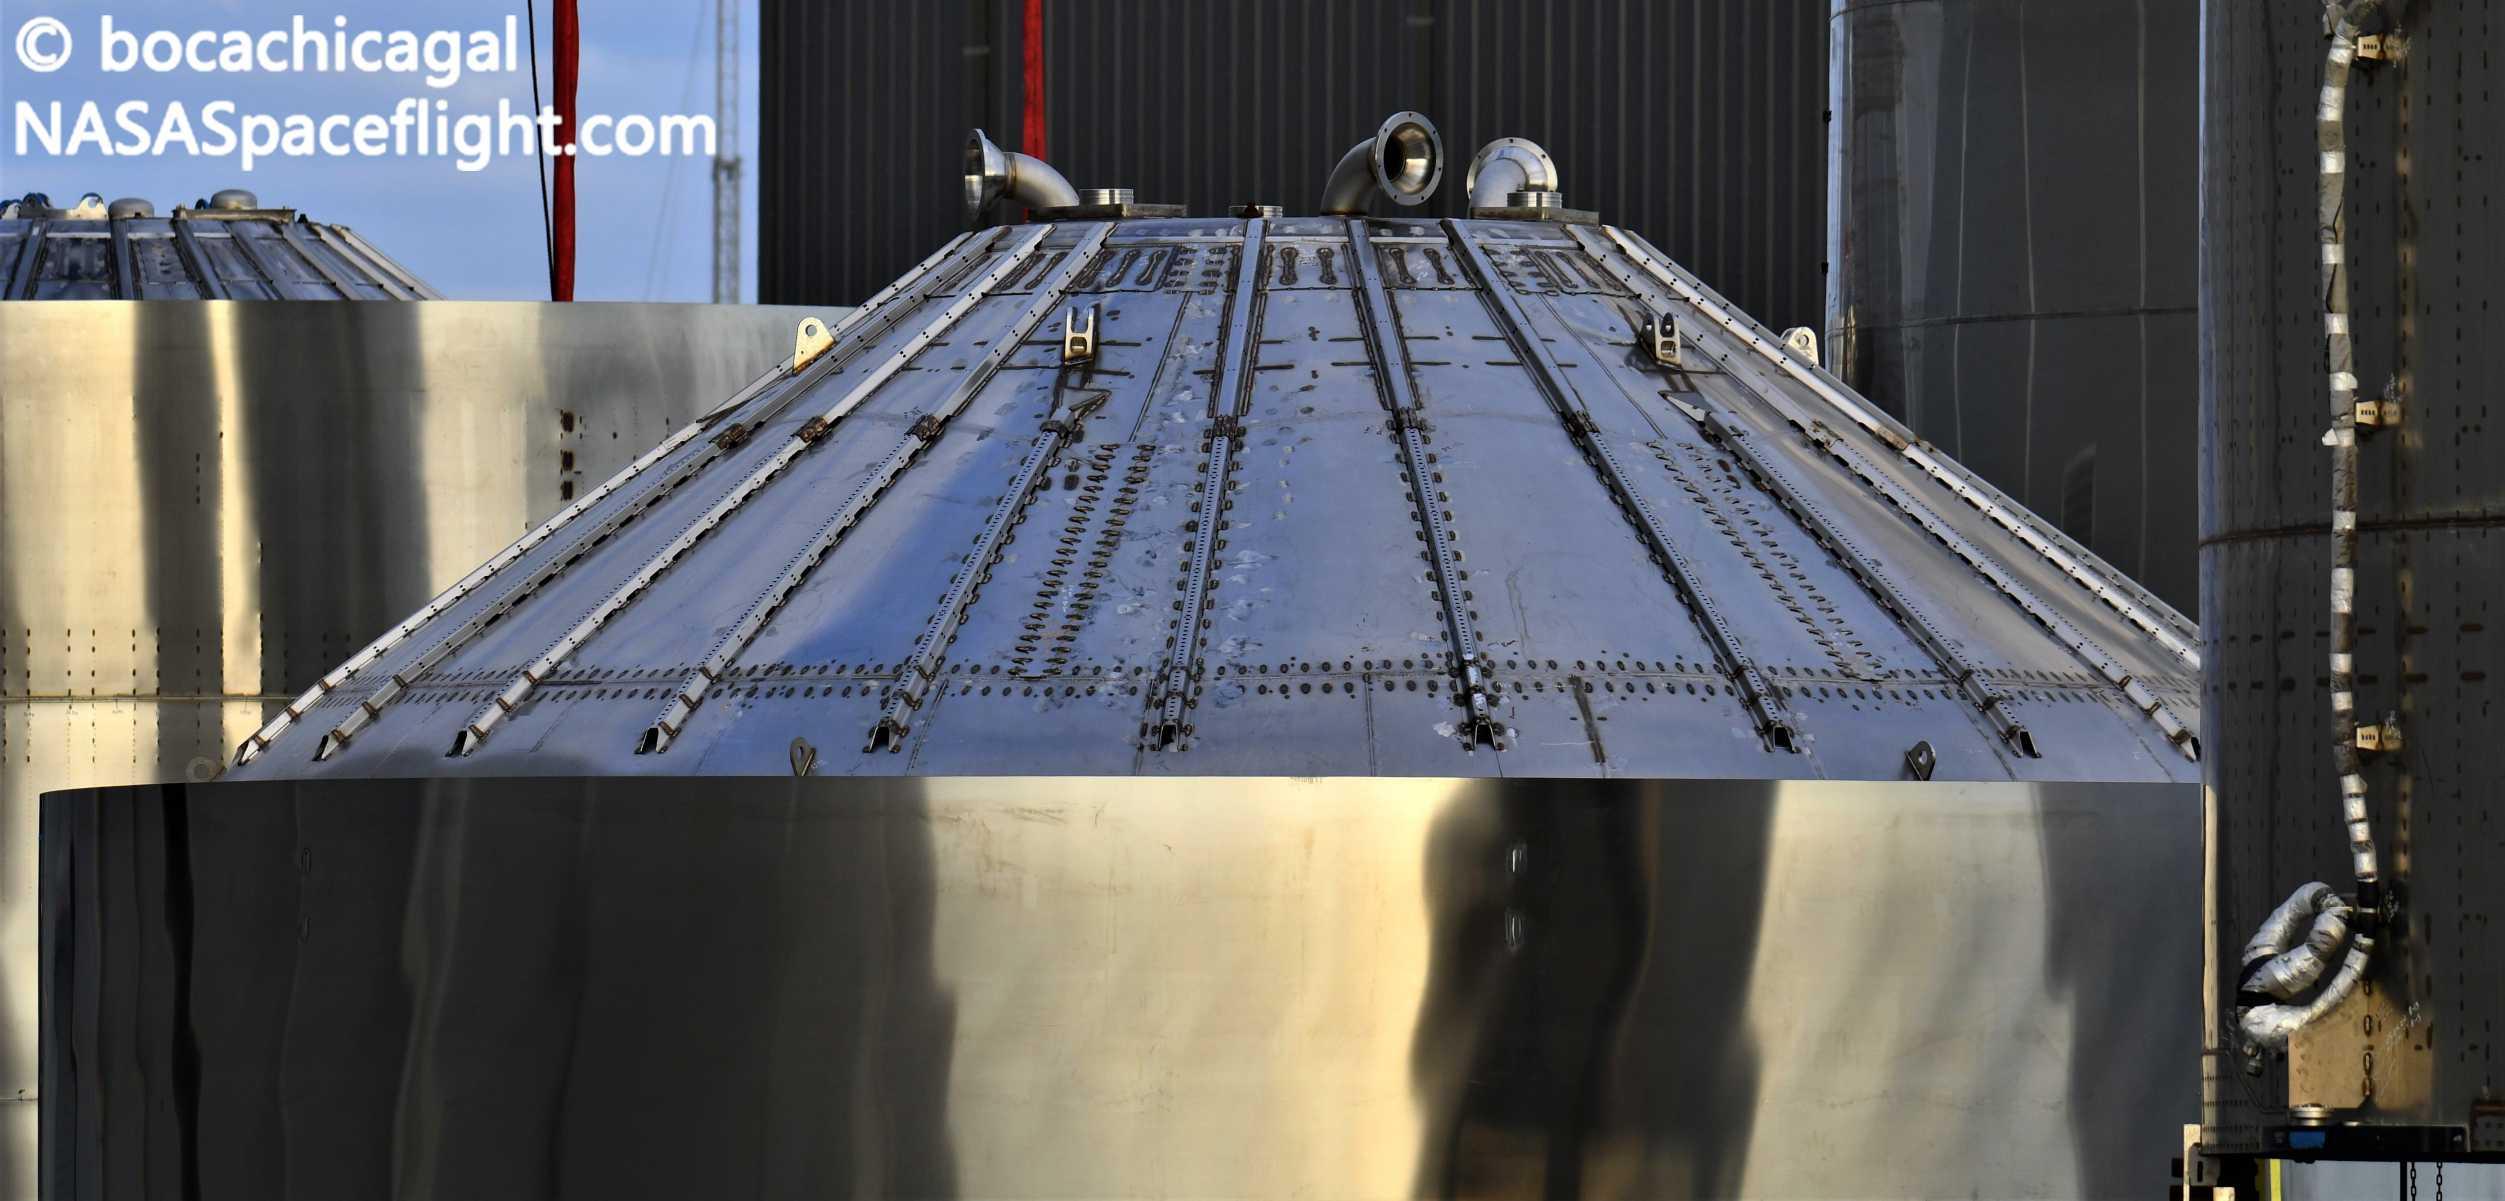 Starship Boca Chica 010321 (NASASpaceflight – bocachicagal) test tank engine section 1 crop (c)